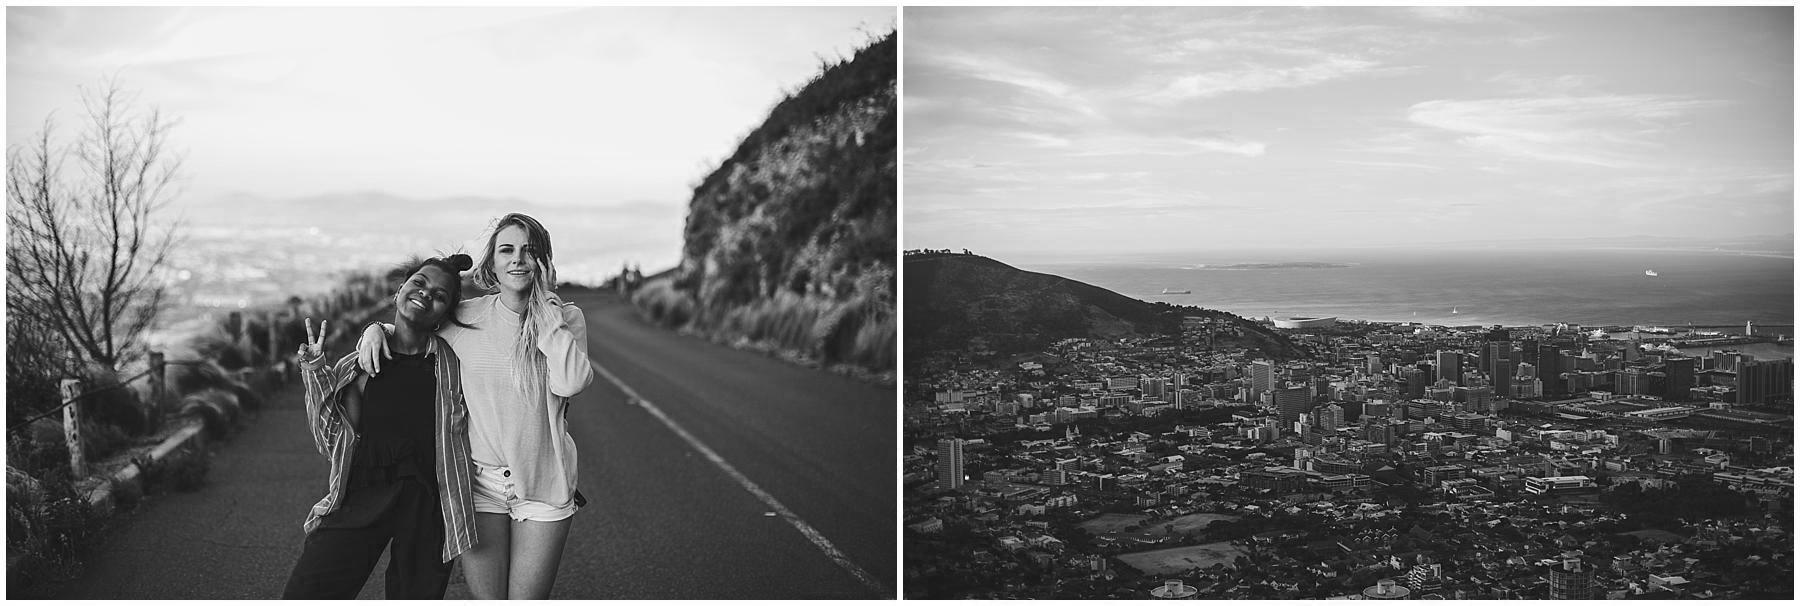 Cape Town_Tafelberg_0044.jpg